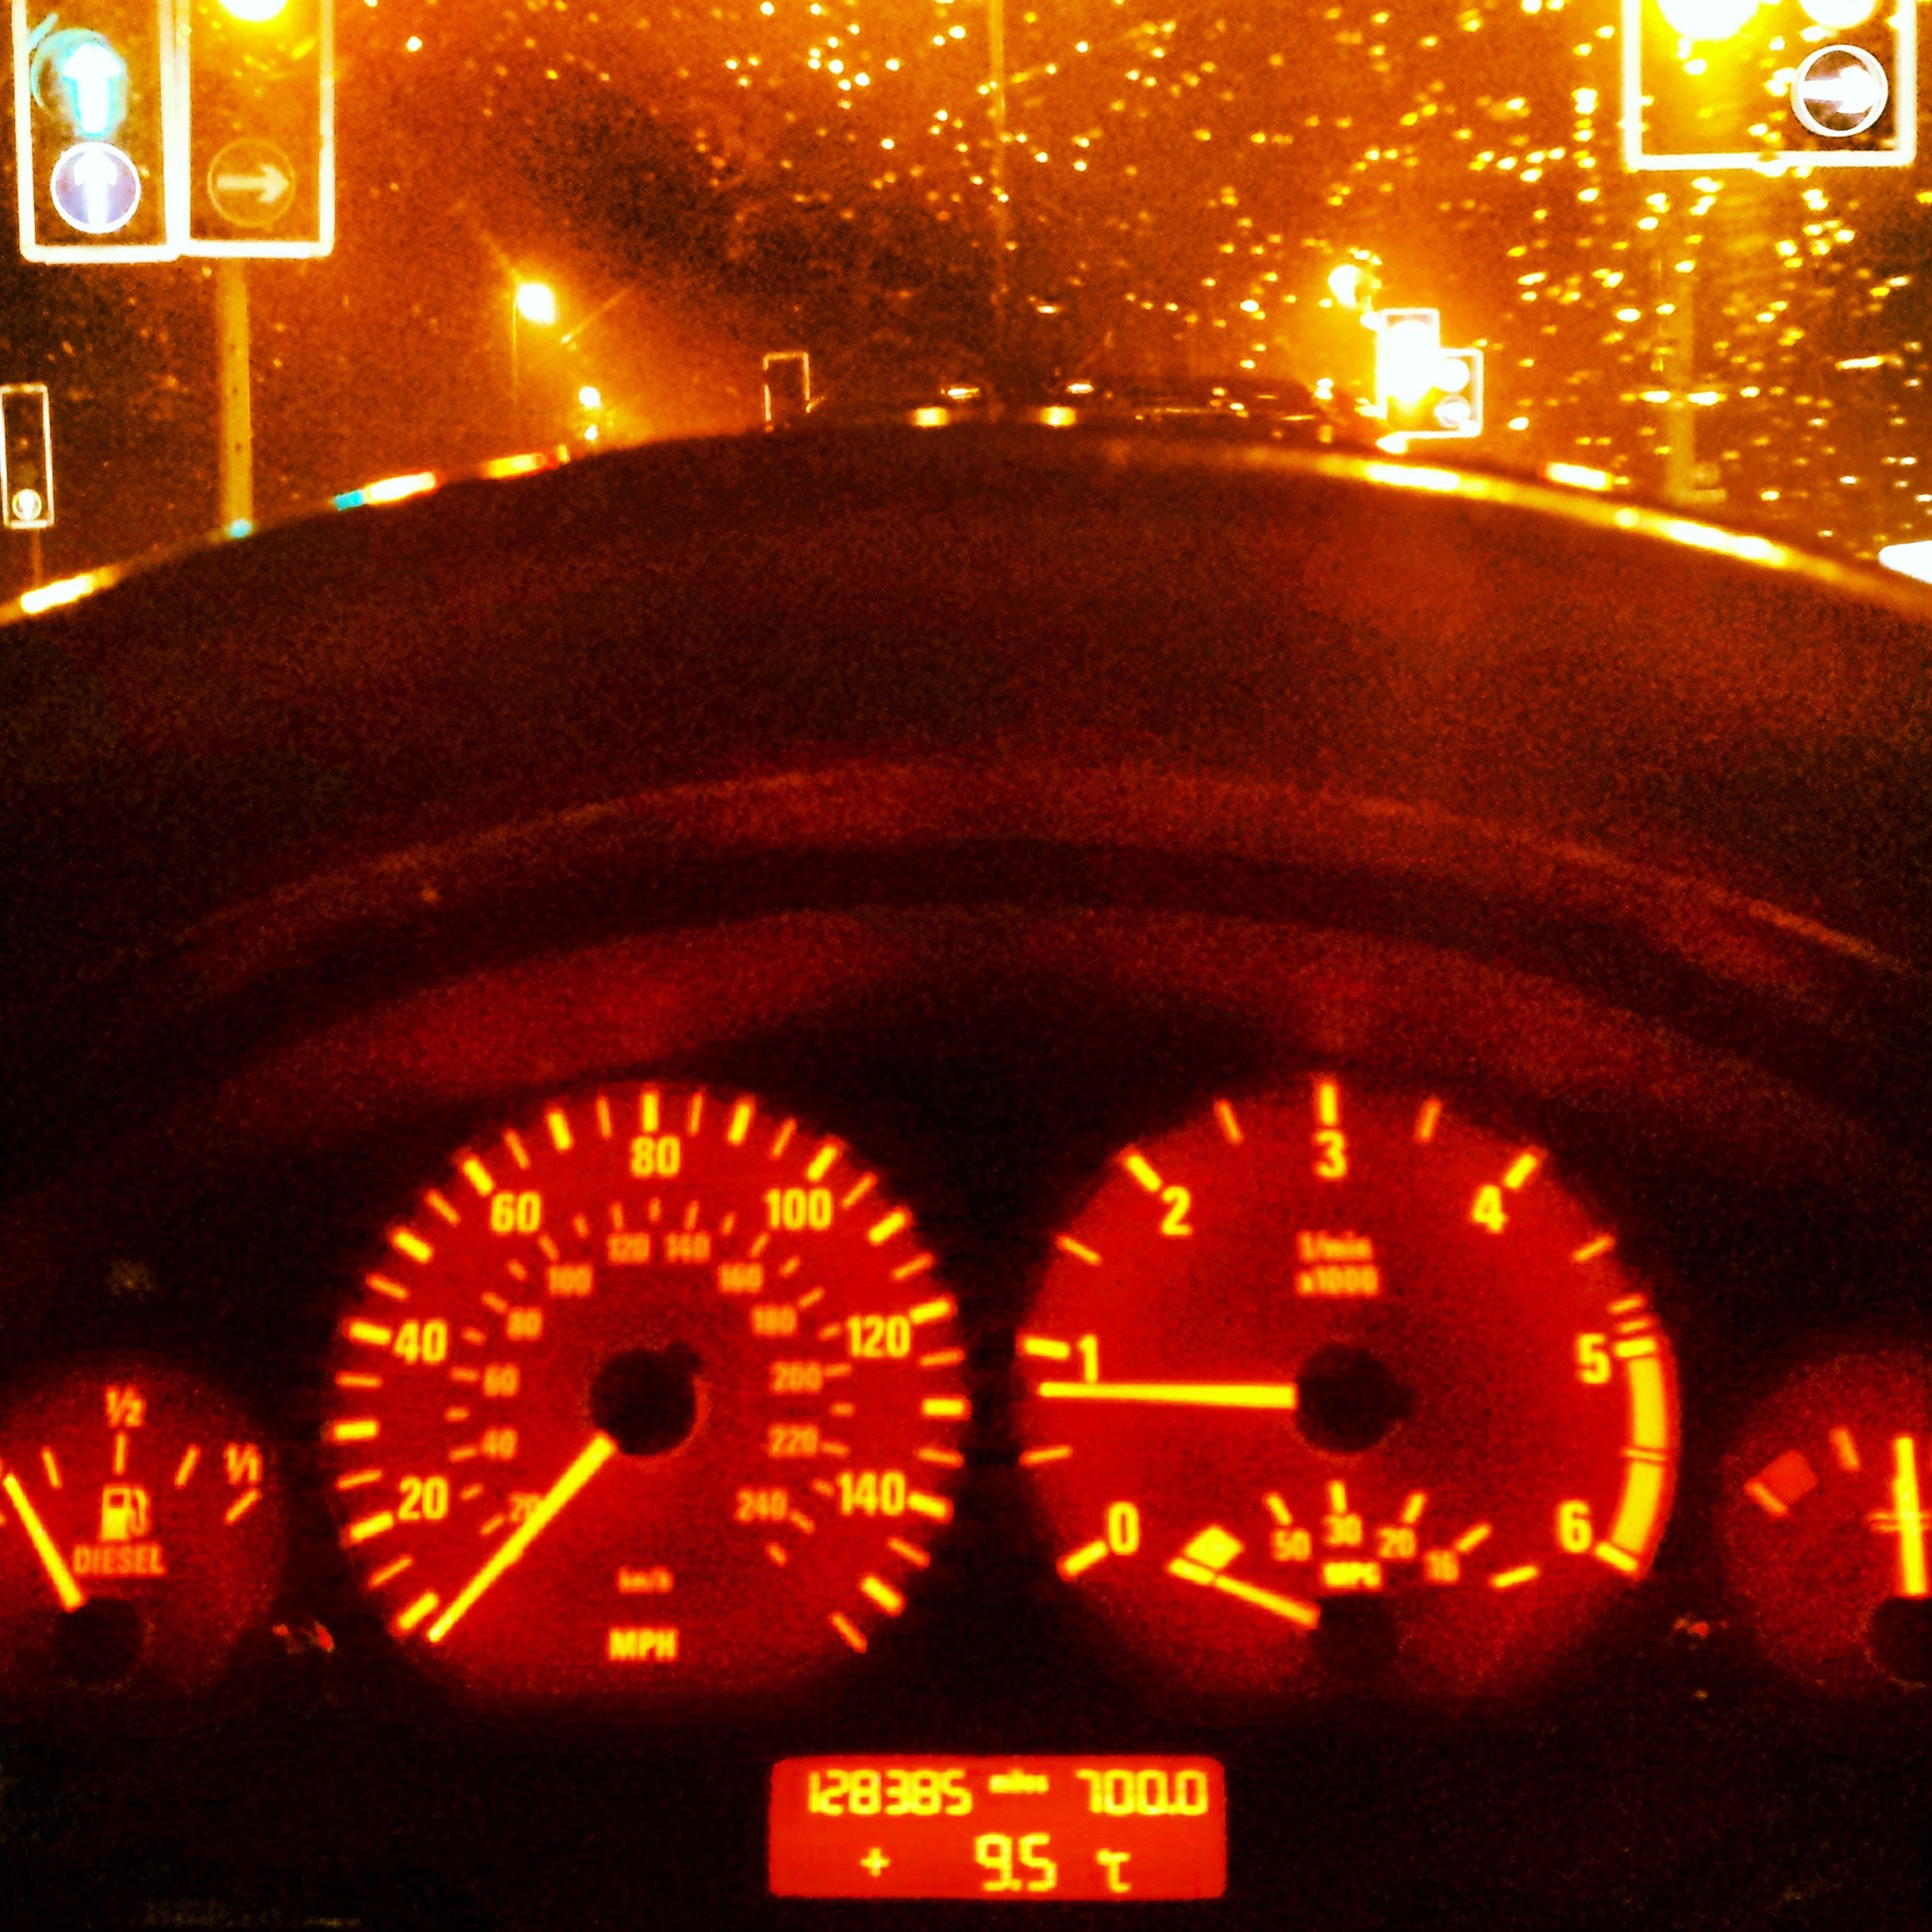 illuminated, night, transportation, text, mode of transport, land vehicle, car, communication, street, lighting equipment, number, road, western script, glowing, headlight, information sign, no people, guidance, light - natural phenomenon, speed